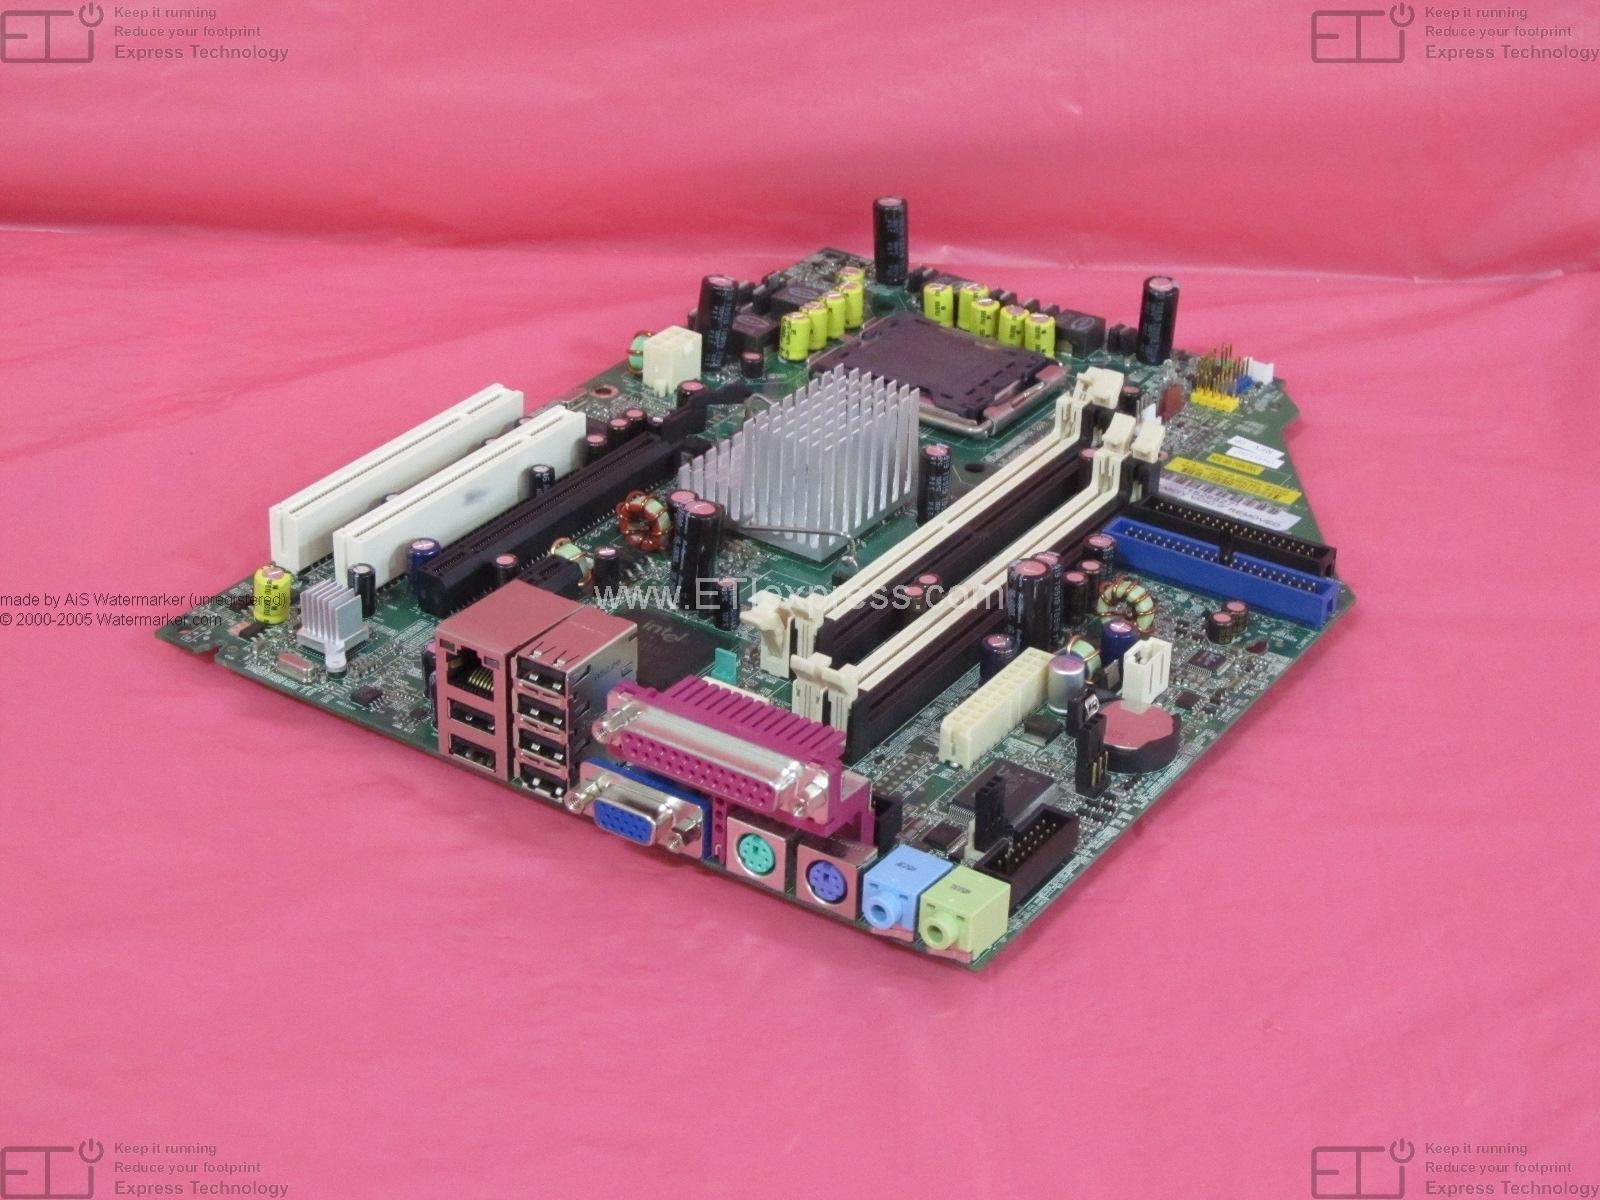 Refurbished Motherboards Hewlett-Packard ®